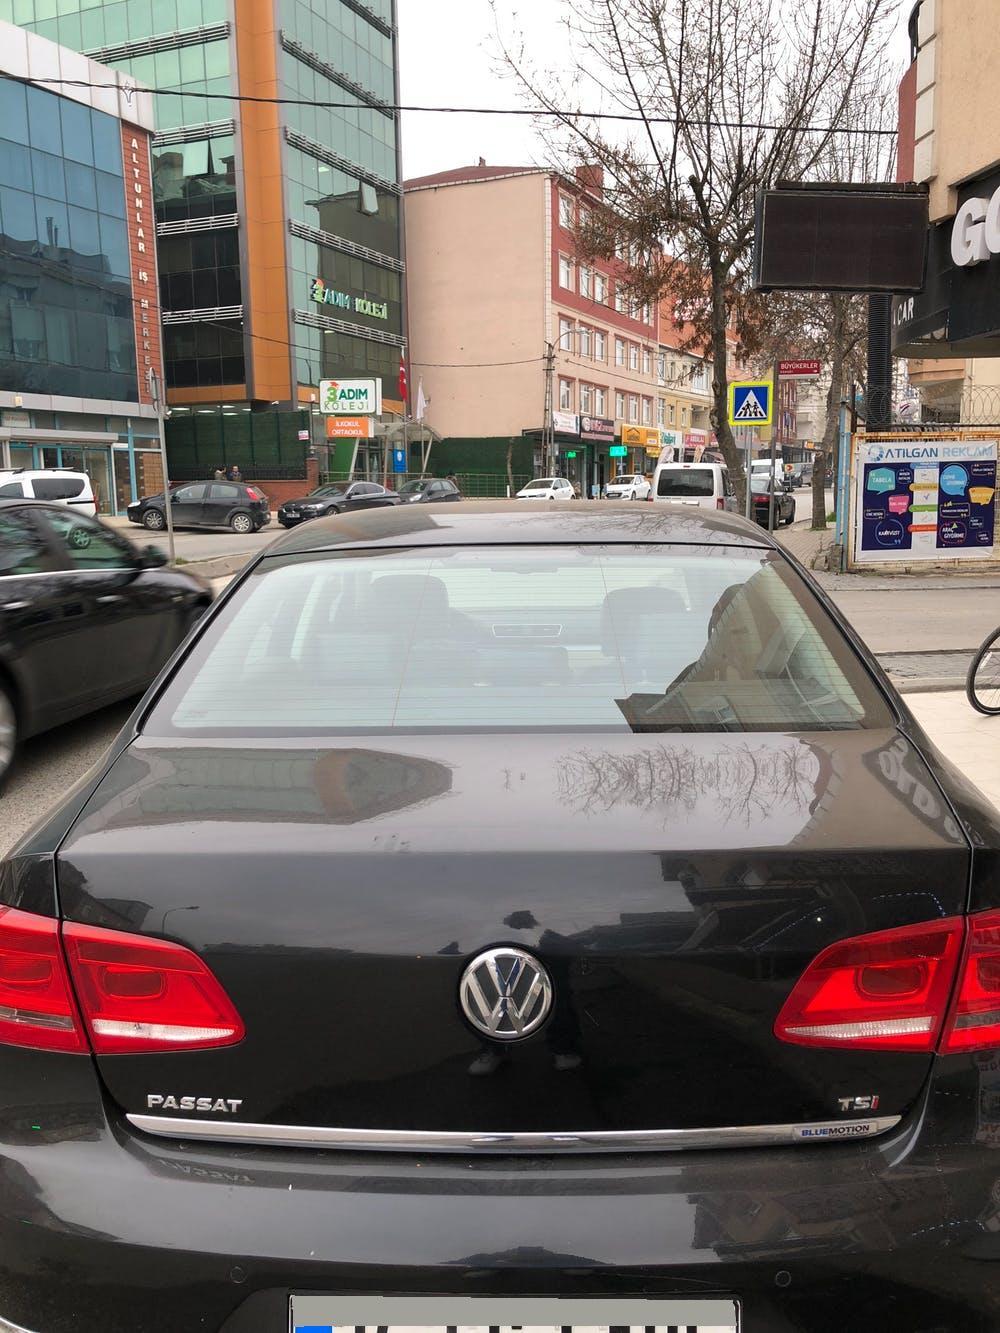 VOLKSWAGEN Passat 2014 Model Benzin Otomatik Vites Kiralik Araç - B912